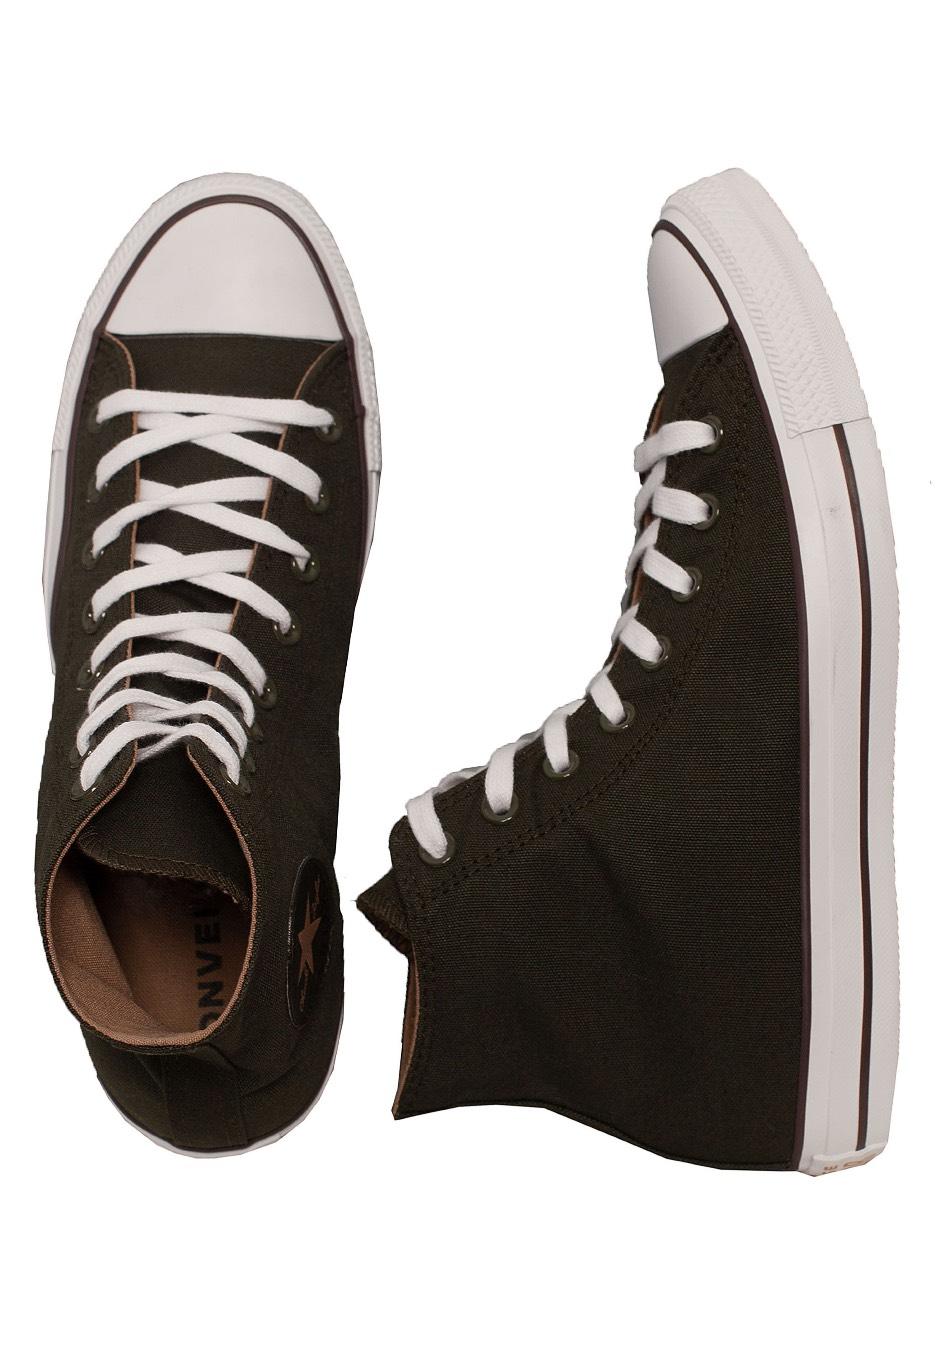 725c6d8e2cbfa8 Converse - Chuck Taylor All Star Hi Utility Green Teak White - Shoes -  Impericon.com UK